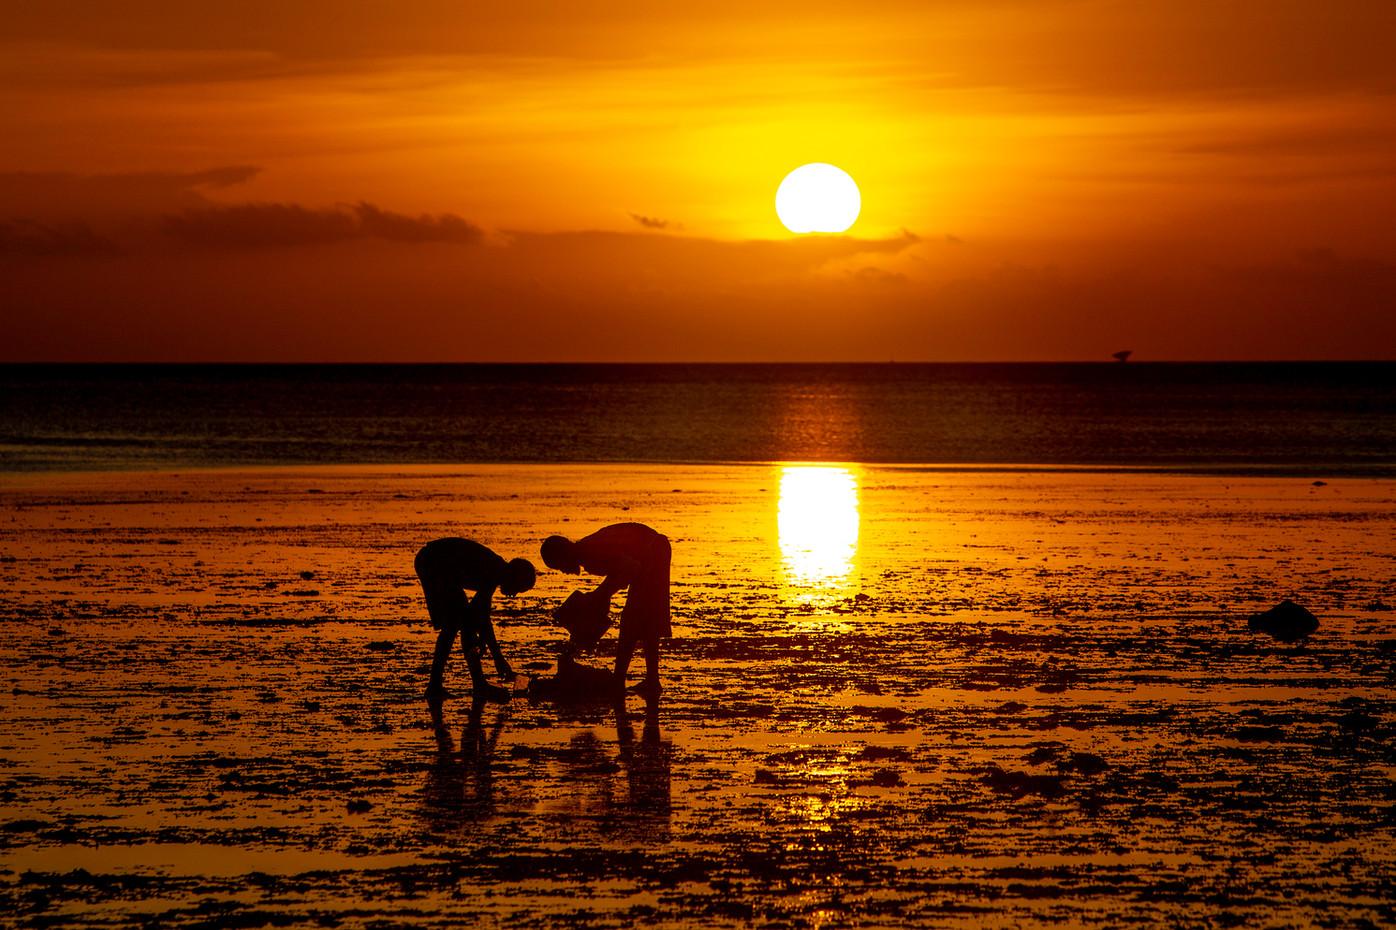 Seaweed collection at sunset on Zanzibar, Tanza